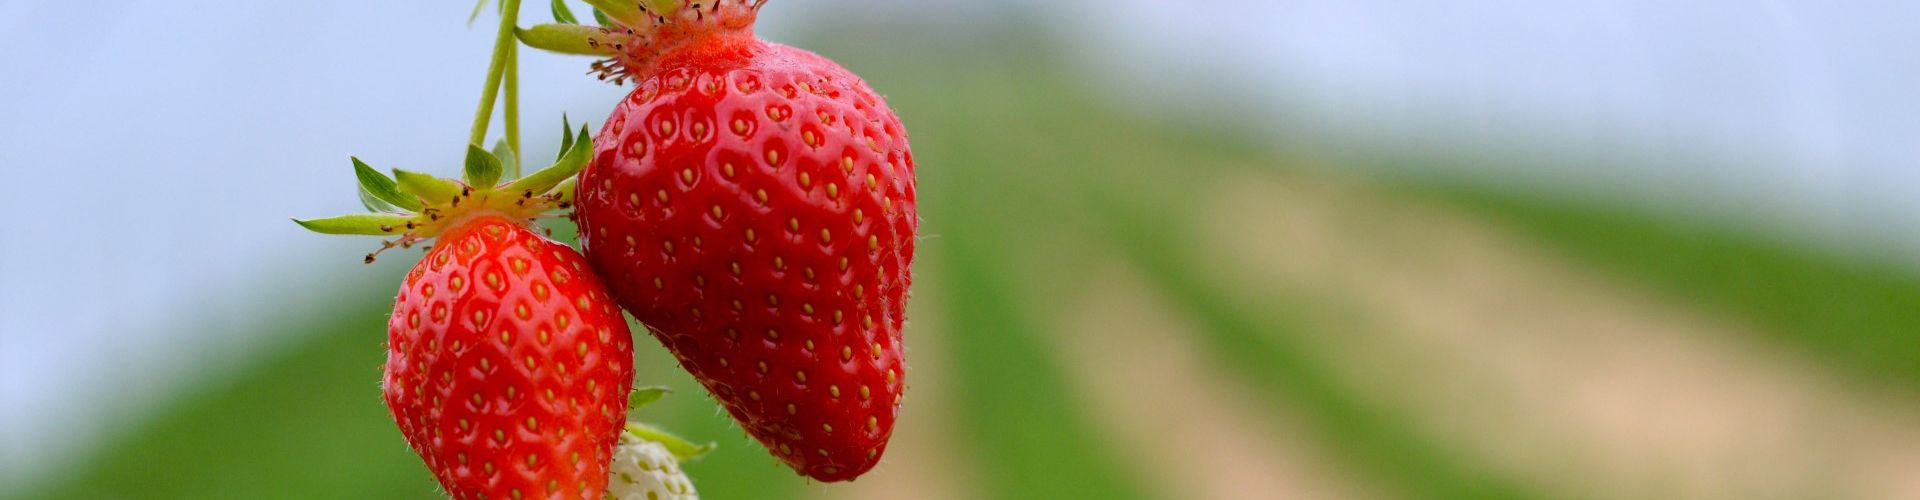 Frühe Erdbeeren aus dem geschützen Anbau